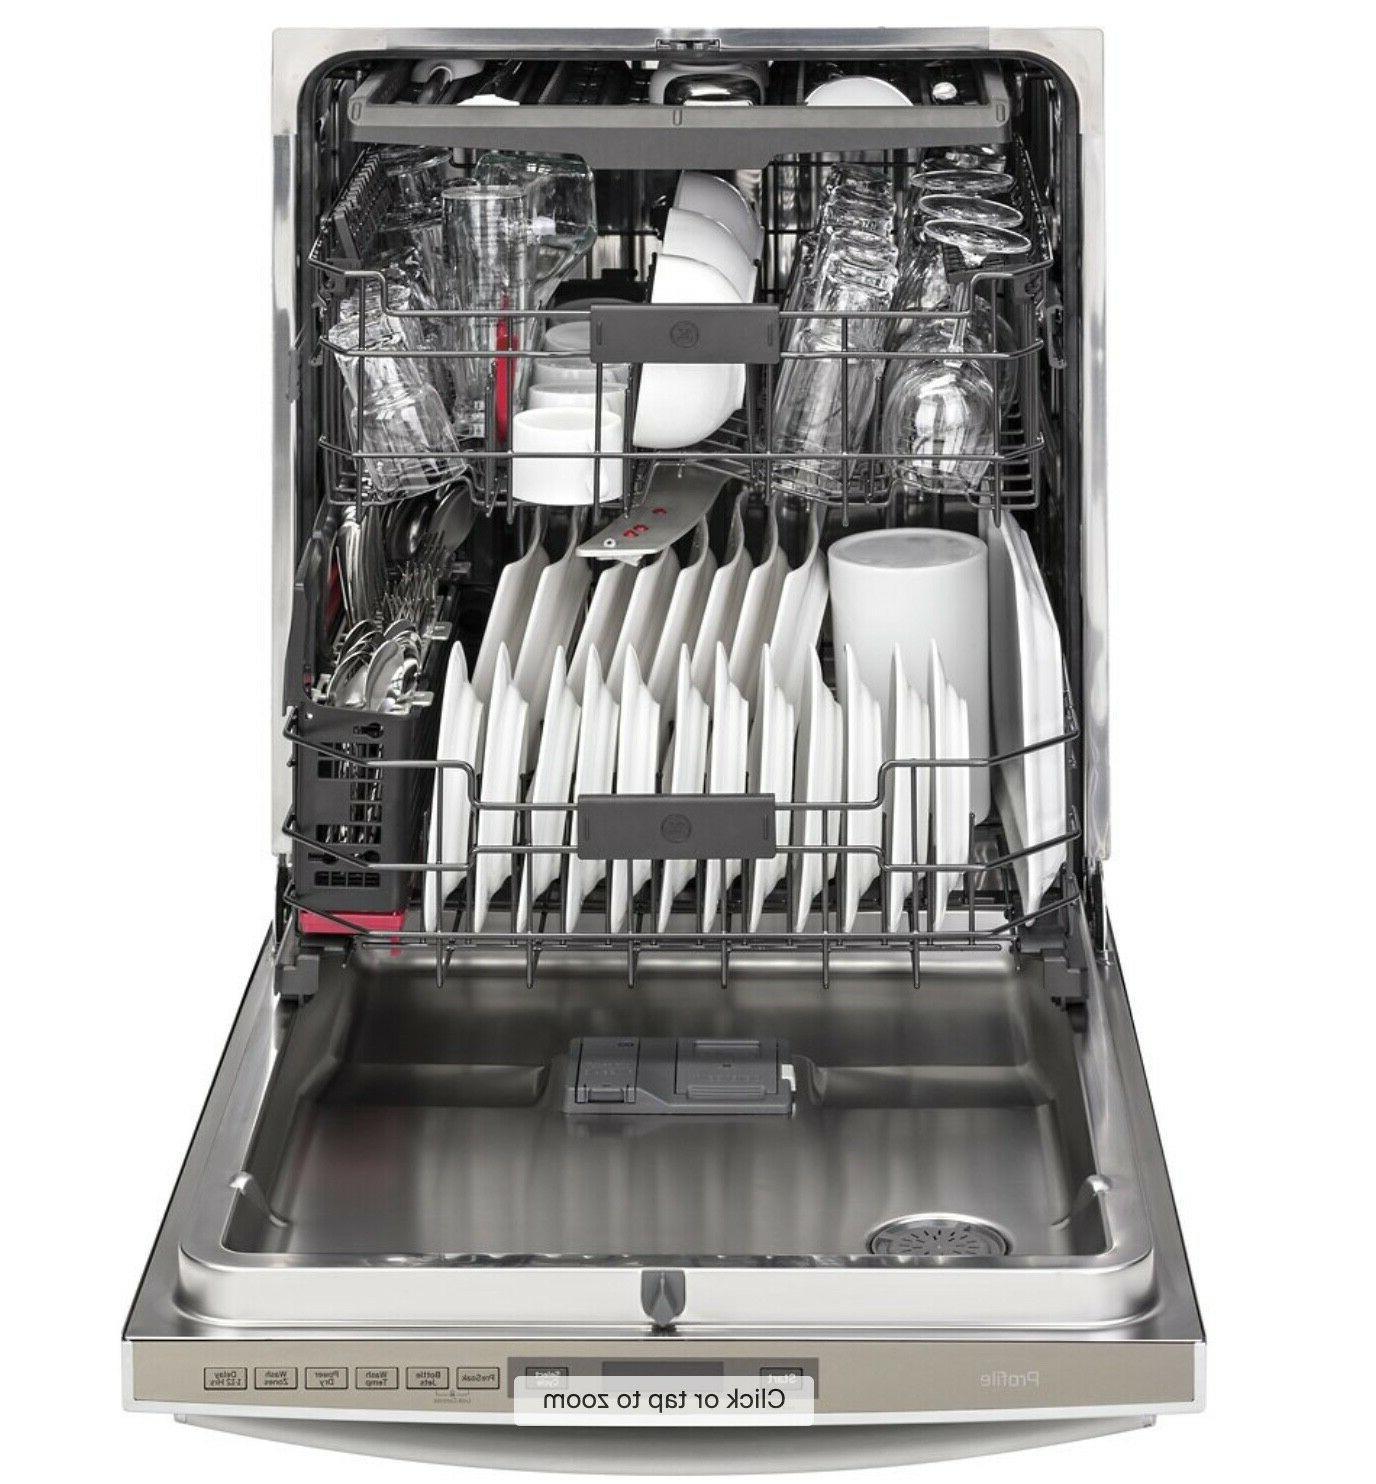 GE PDT855SSJSS Stainless Dishwasher Brand NEW -